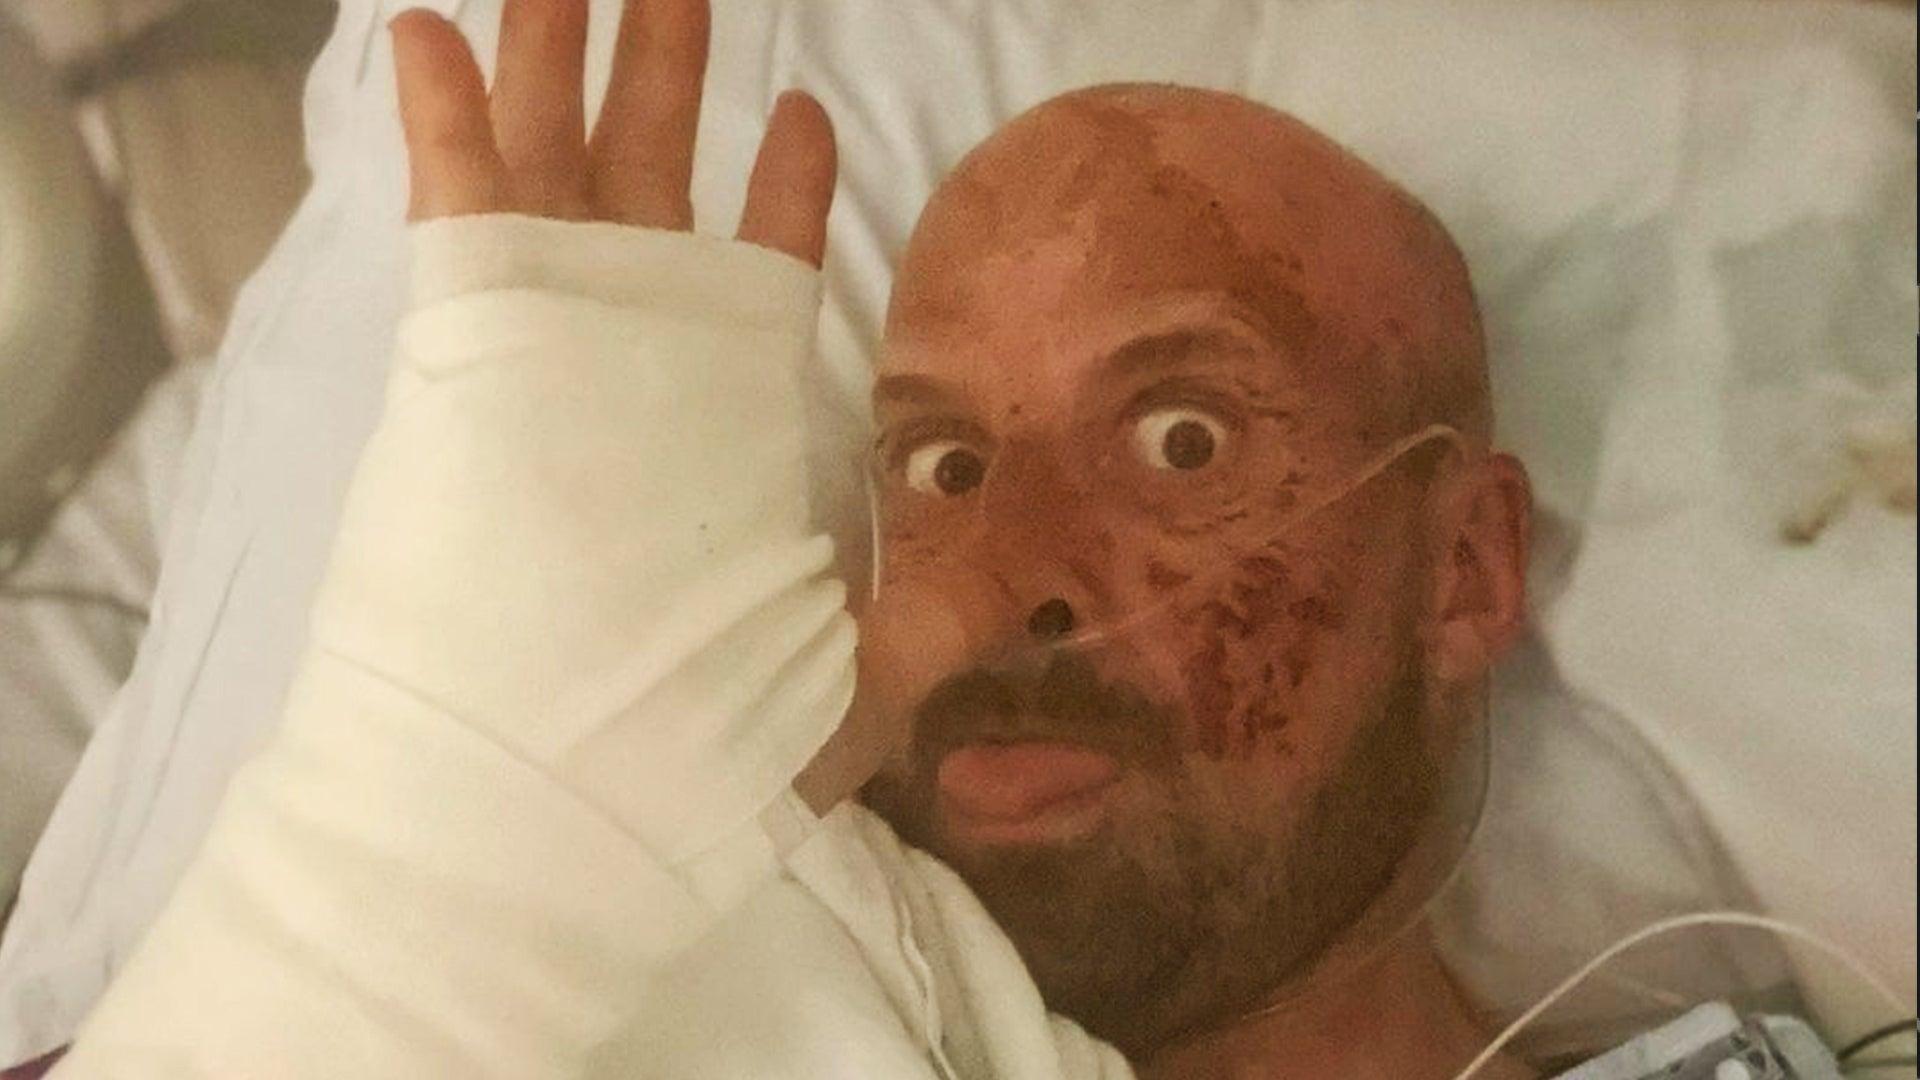 'America's Got Talent: Extreme' Contestant Jonathan Goodwin Shares Hospital Selfie